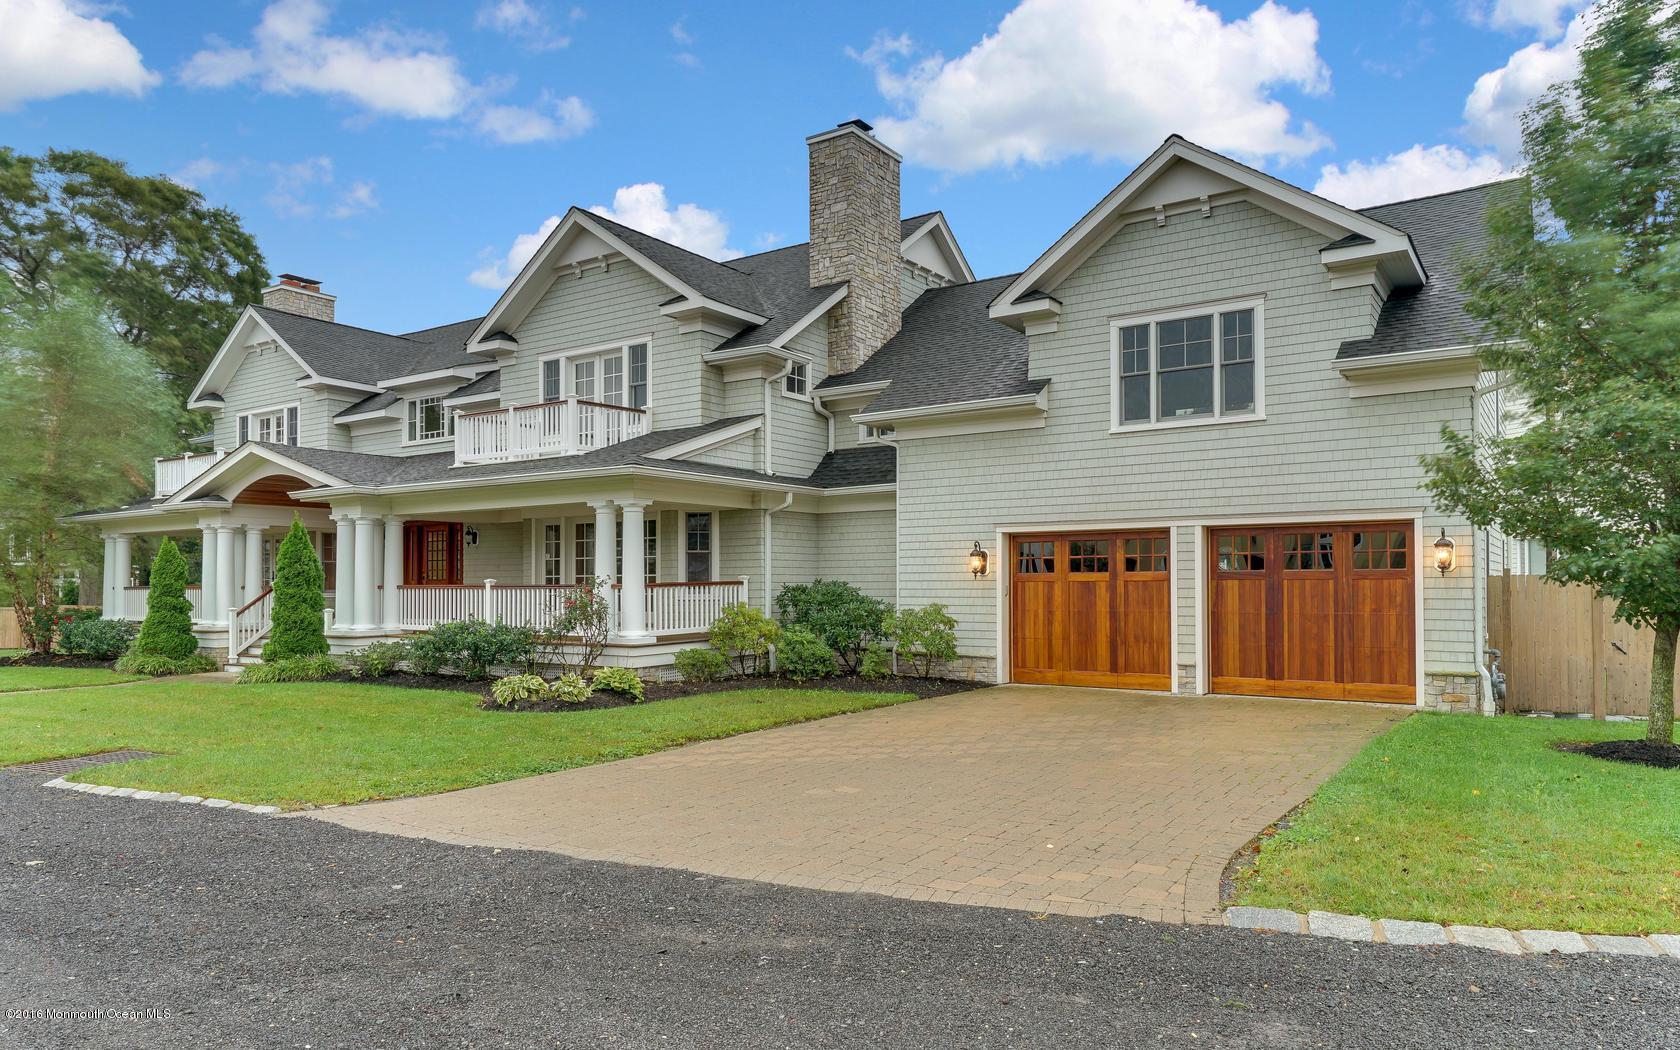 Photo of home for sale at 6 River Vista Lane Lane, Point Pleasant Beach NJ